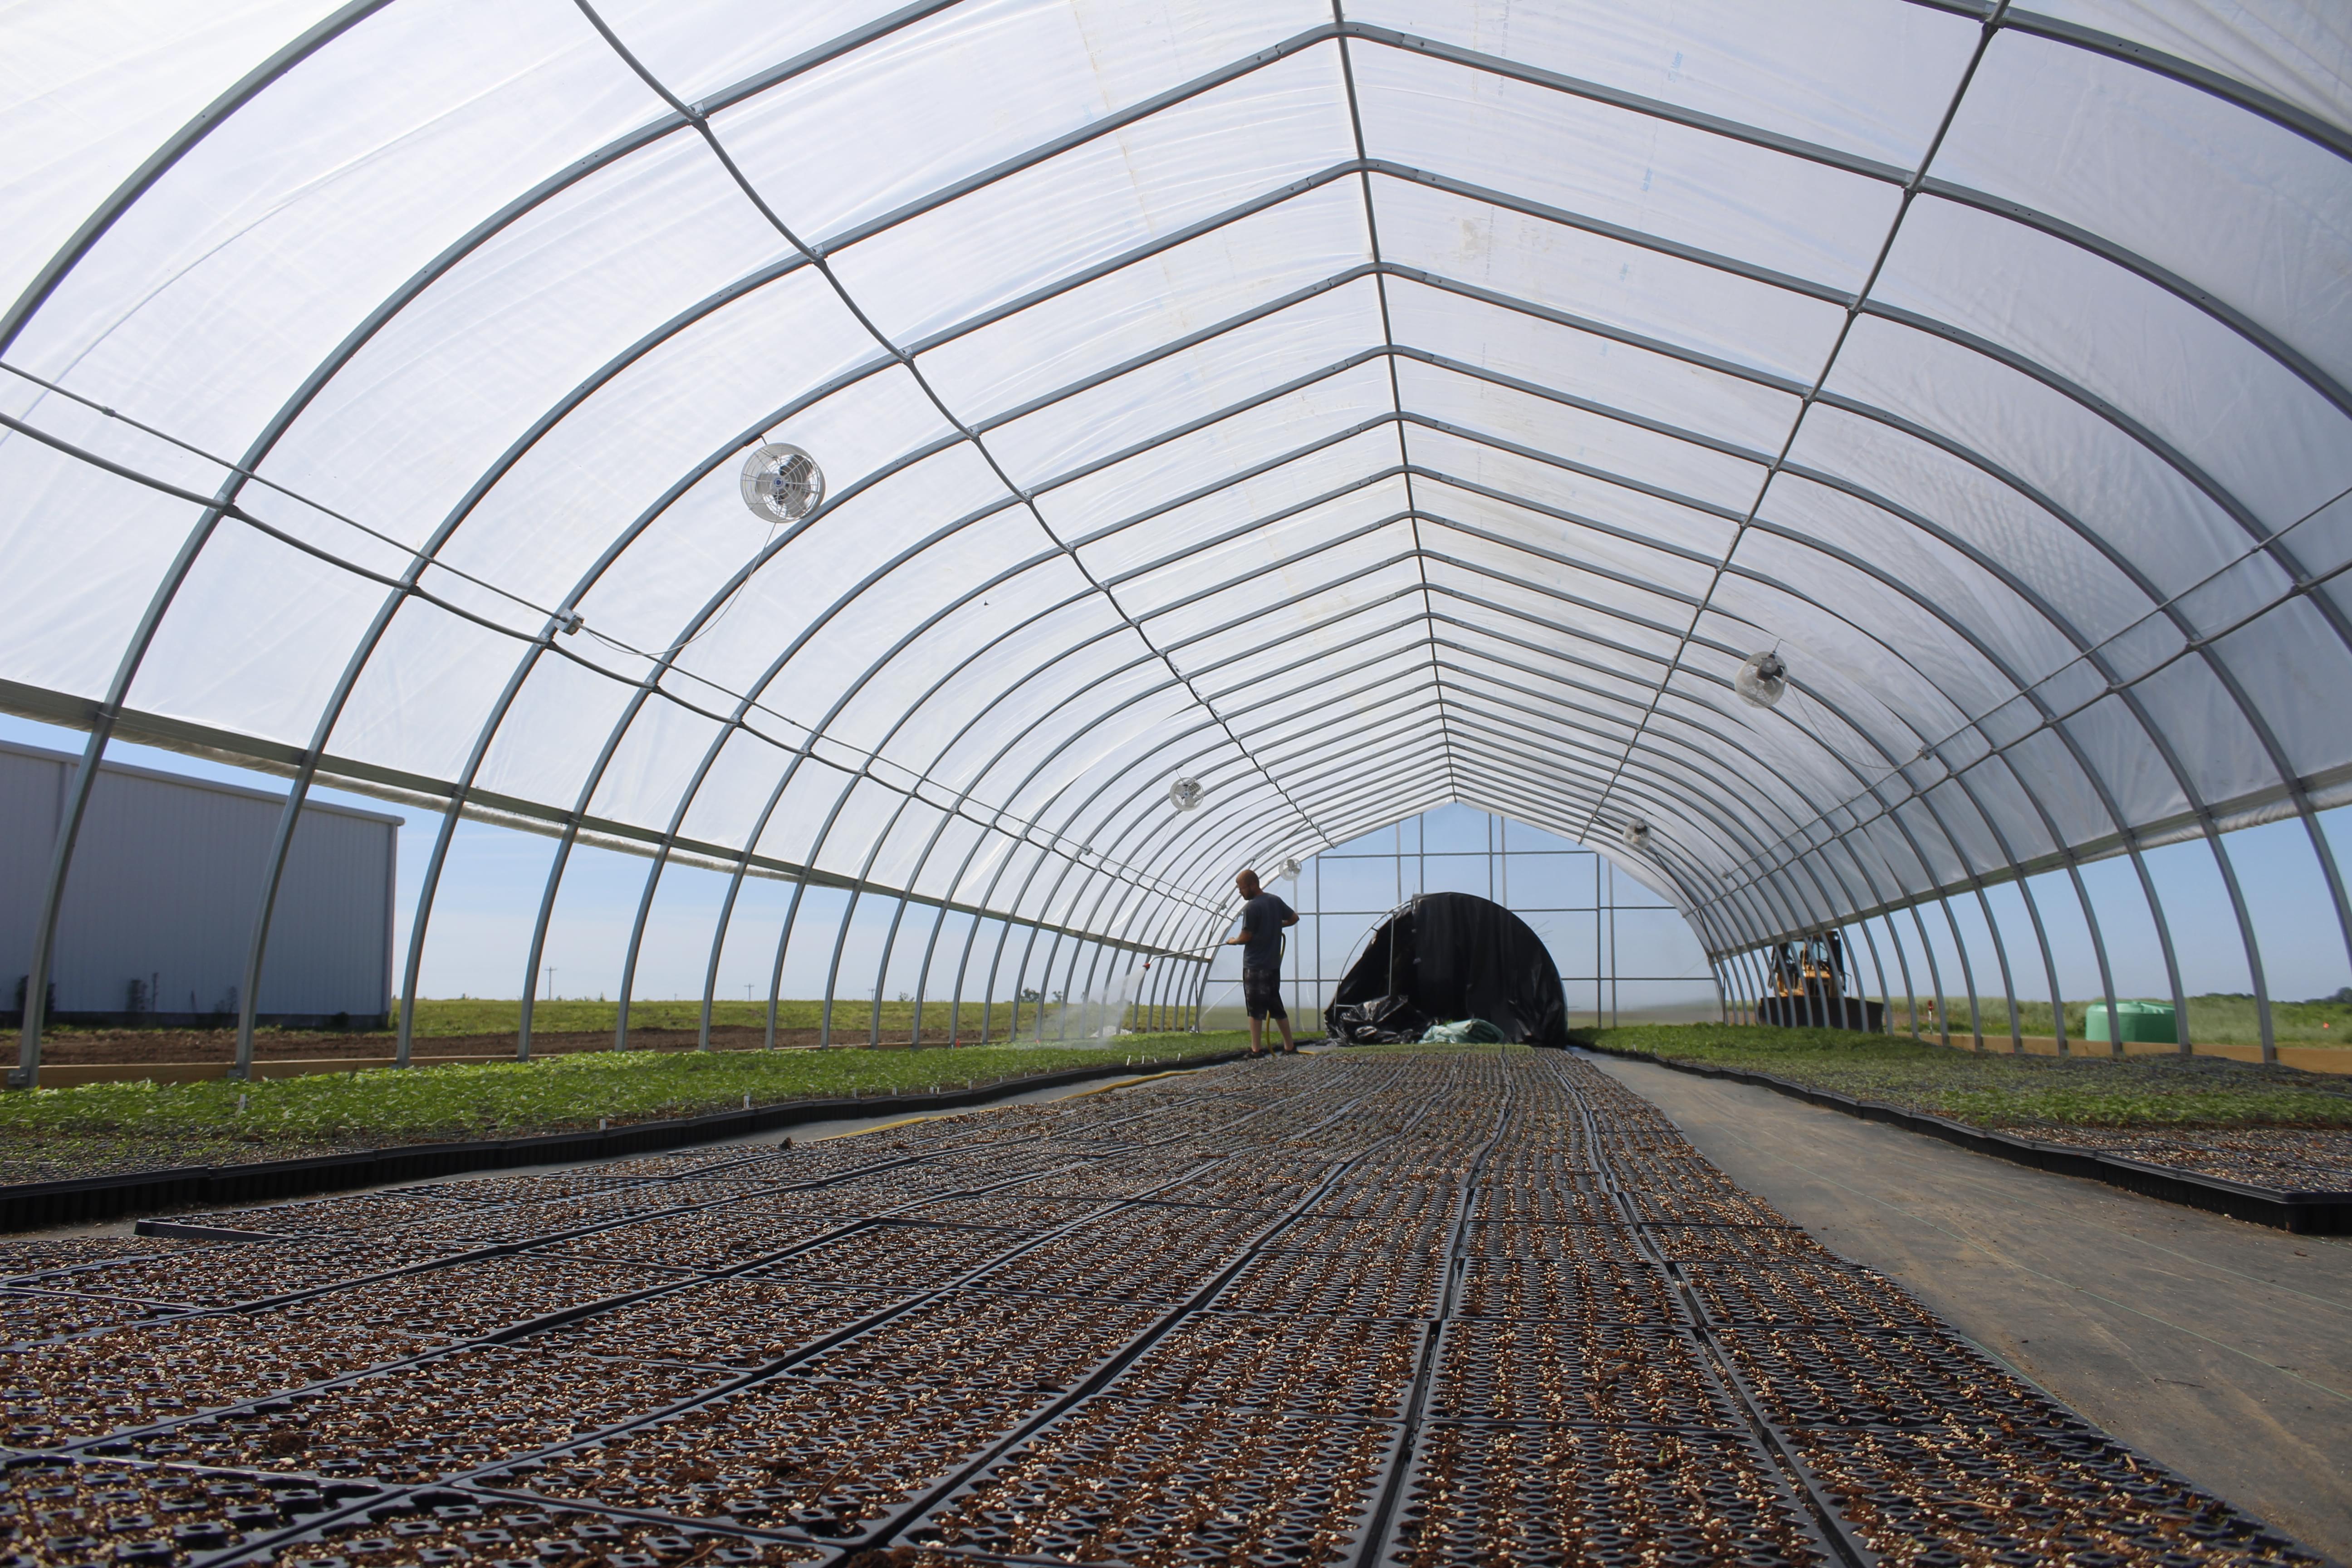 Logan Bird waters about 90,000 hemp seedlings on Andy Huston's farm in western Illinois.